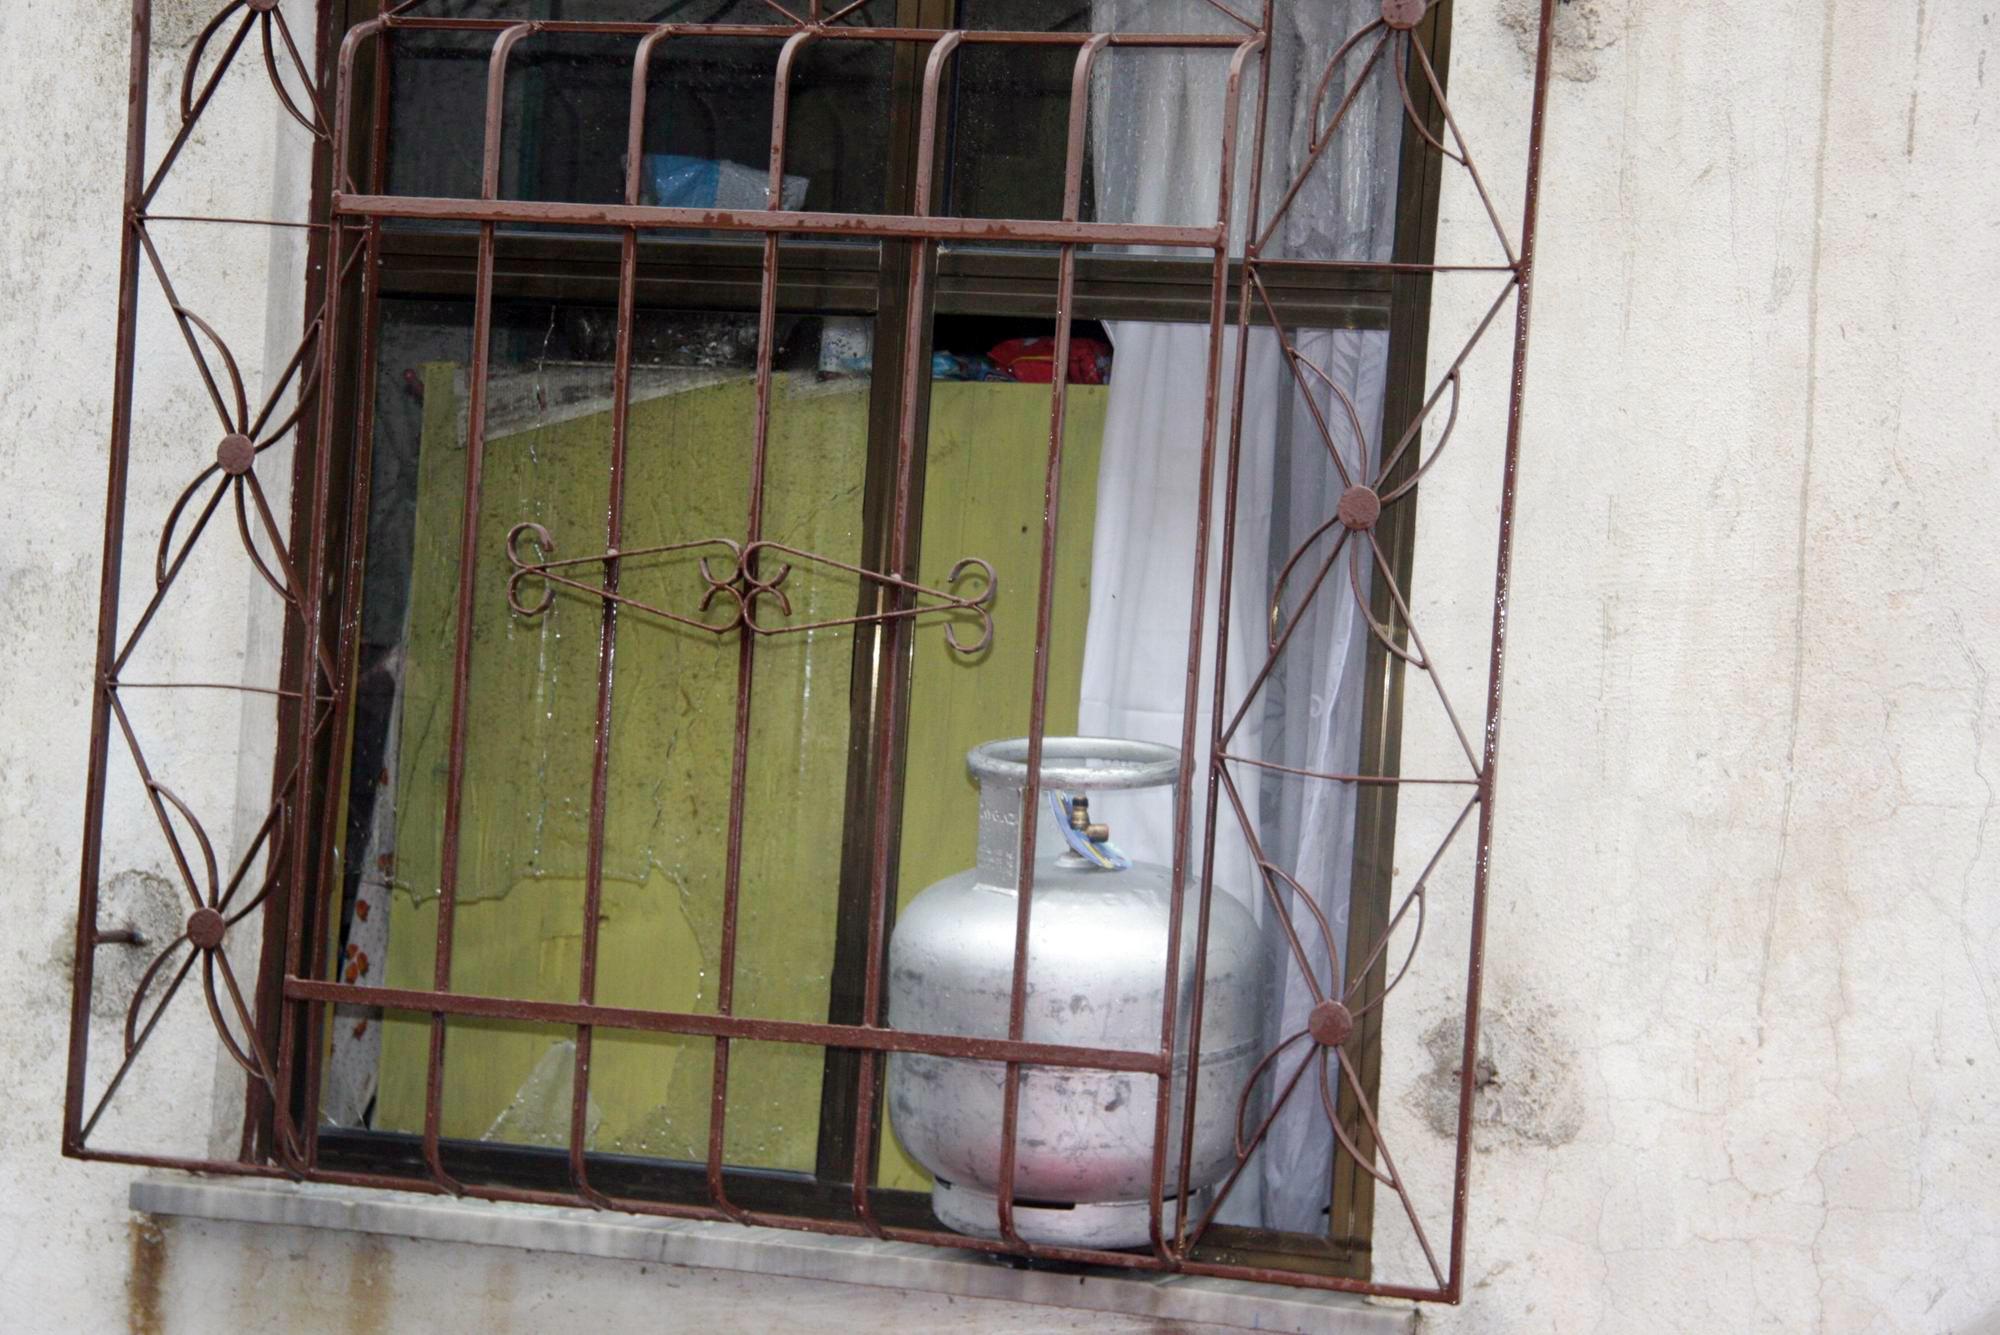 Bursa'da pompalı dehşeti: 3 polis yaralı 10